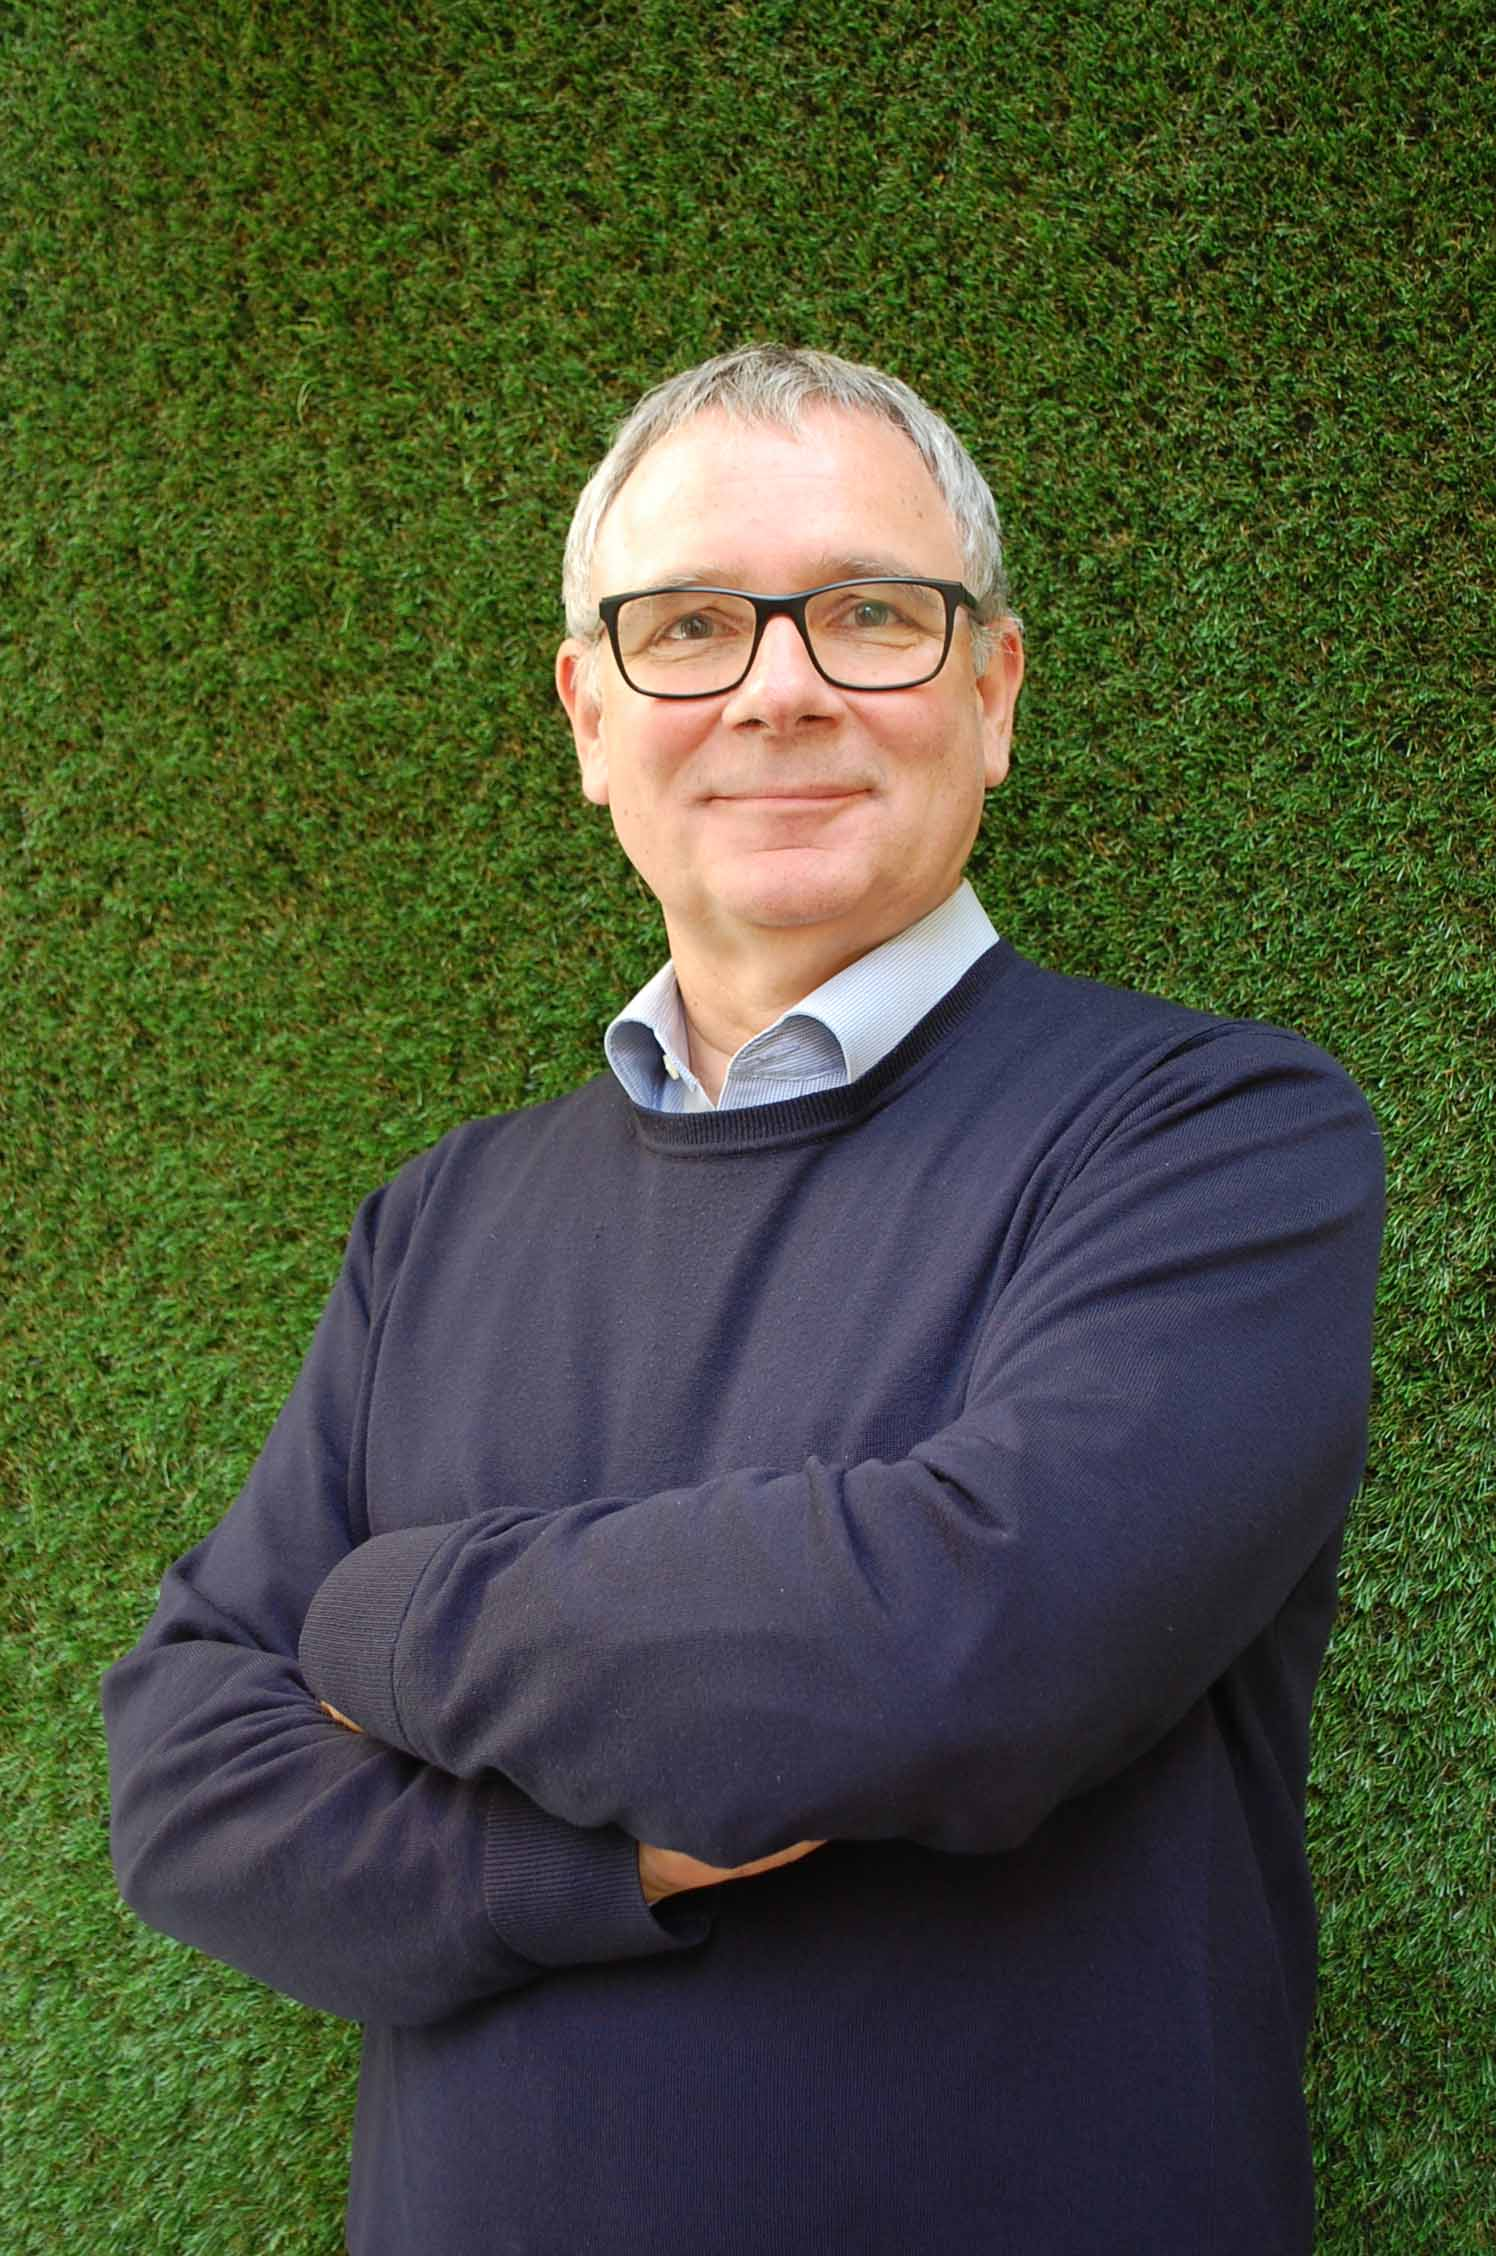 Andreas Kipar  Landscape Architect  Founding Member